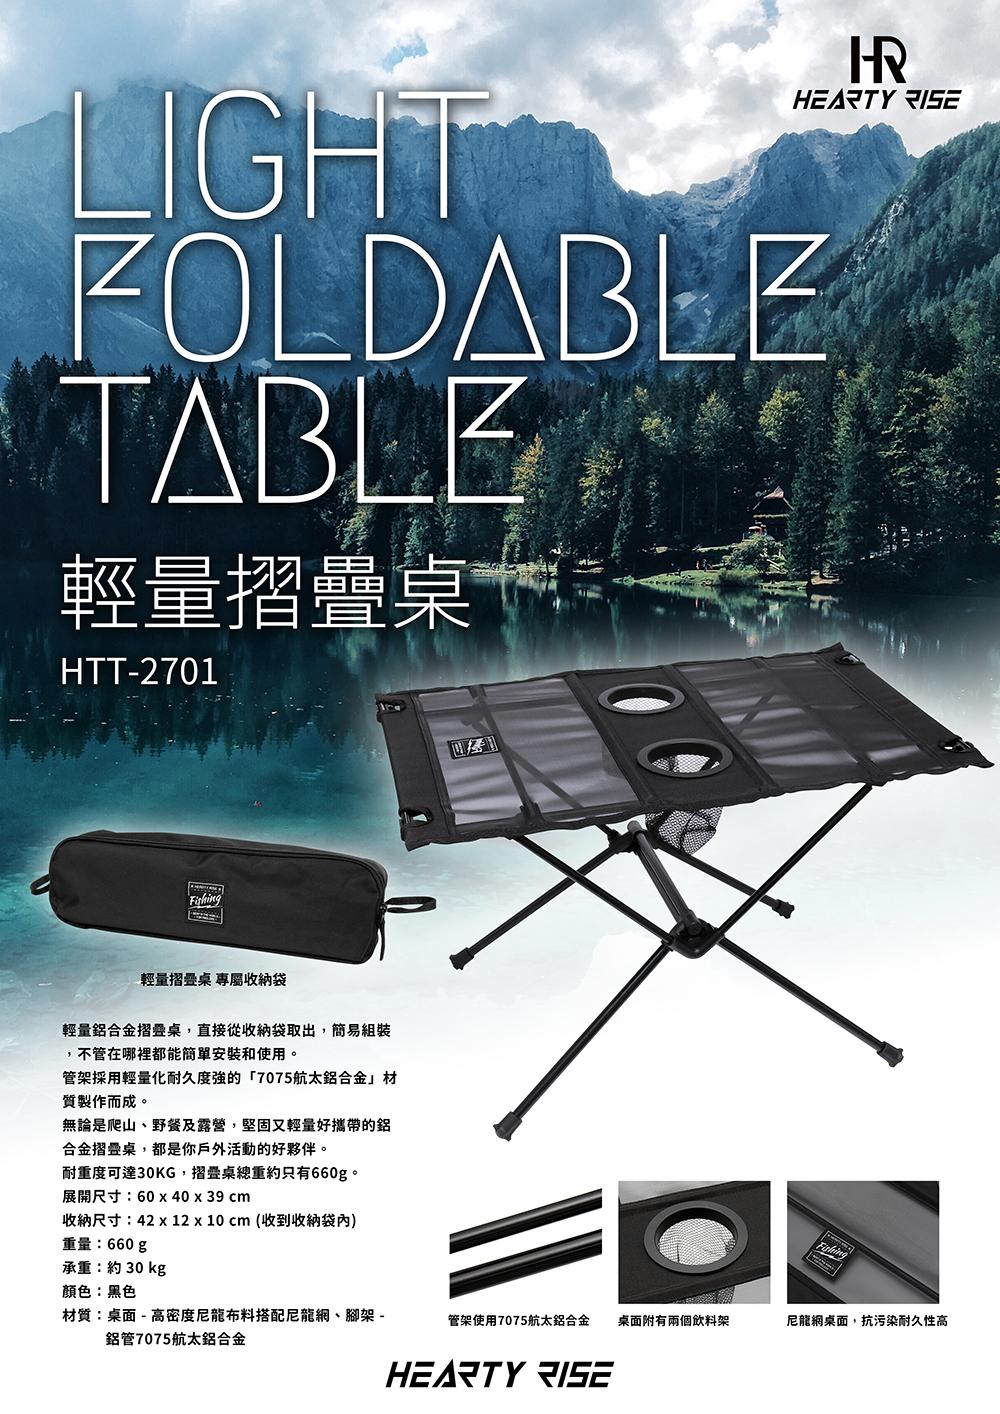 HR 輕量摺疊桌 HTT-2701 1000